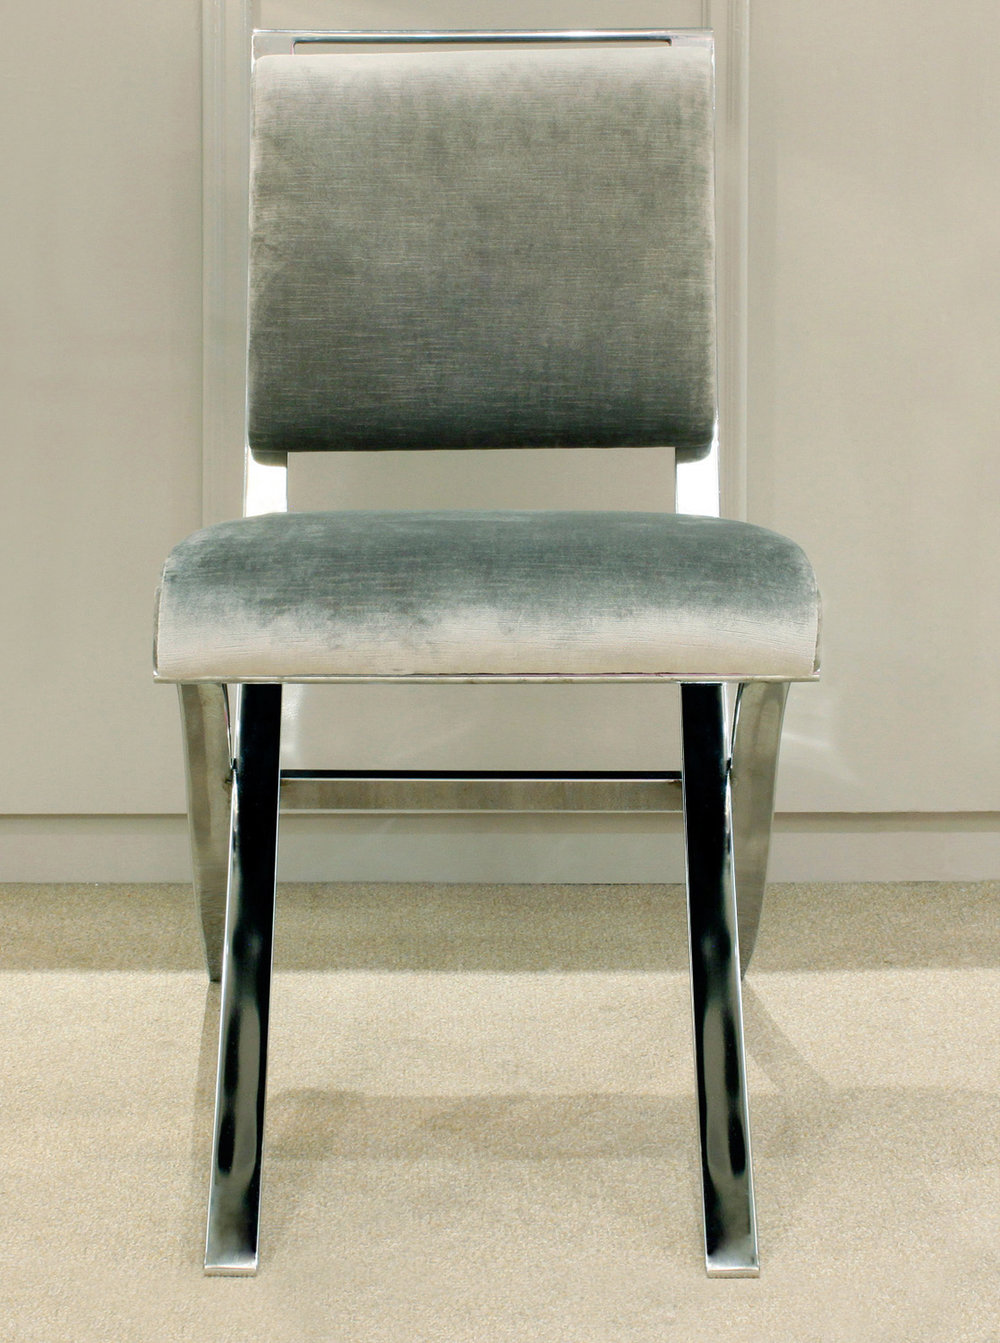 70s 35 X frame uph seat+bk deskchair24 hires detail.jpg